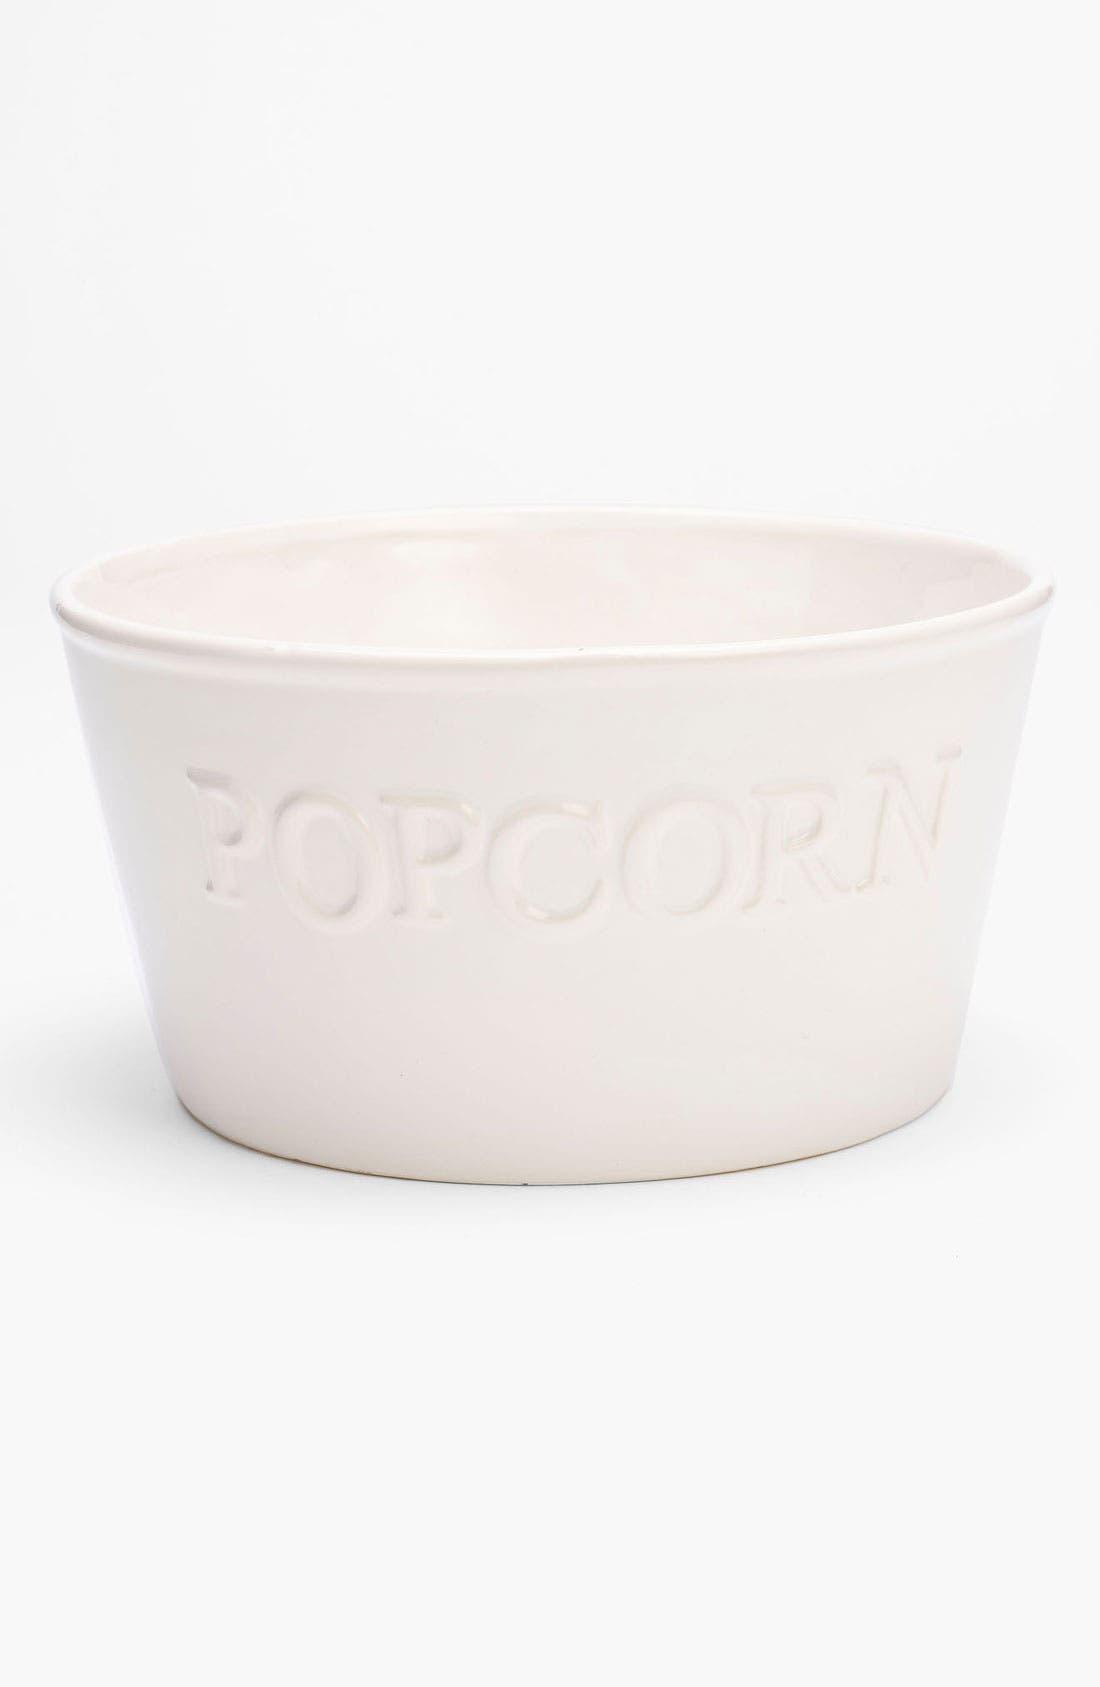 Main Image - Torre & Tagus 'Large Popcorn' Ceramic Bowl